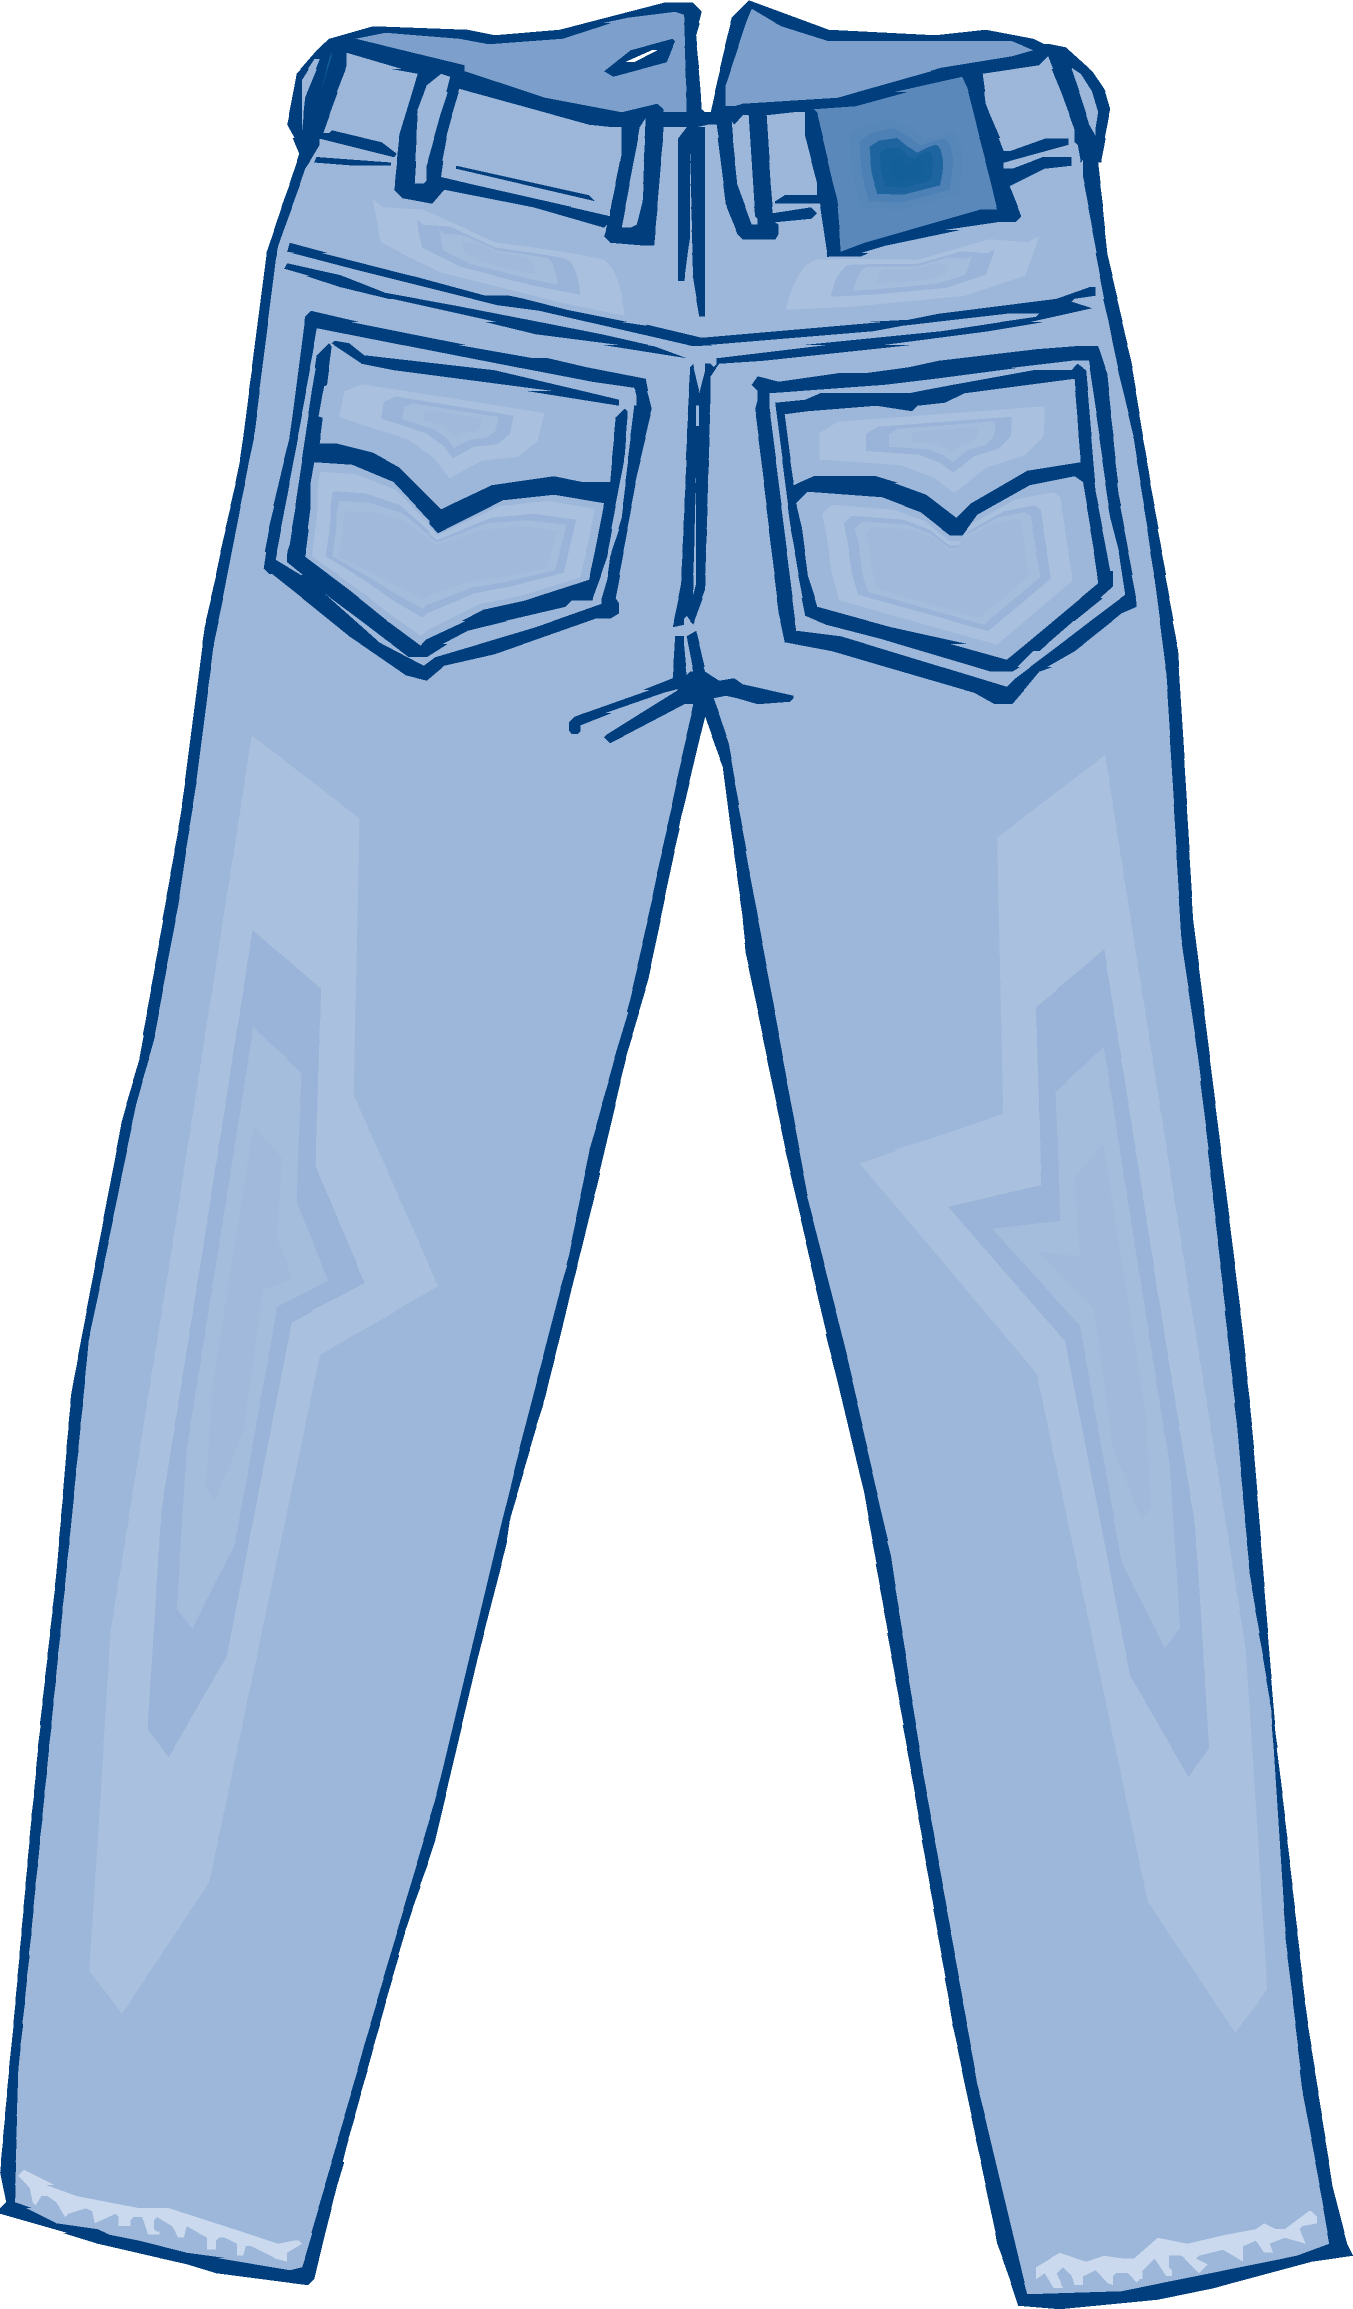 Pants clipart long pants. Portal